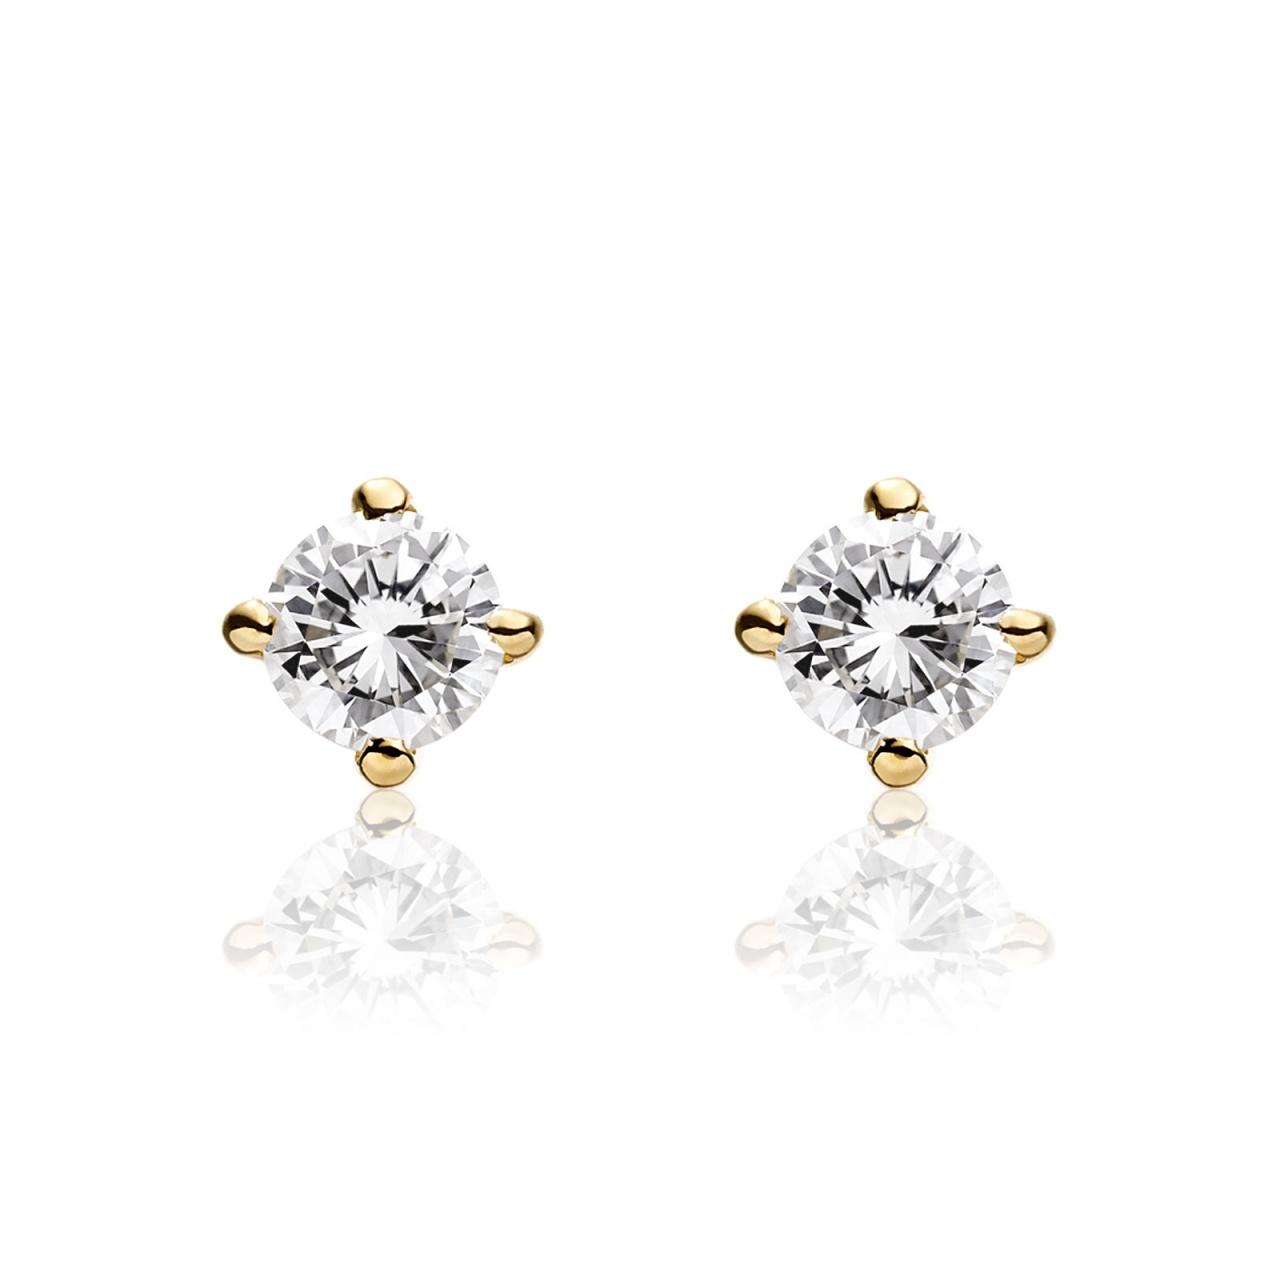 Diamond Studs in Yellow Gold with Akoya Pearls-AEWRYG0477-1